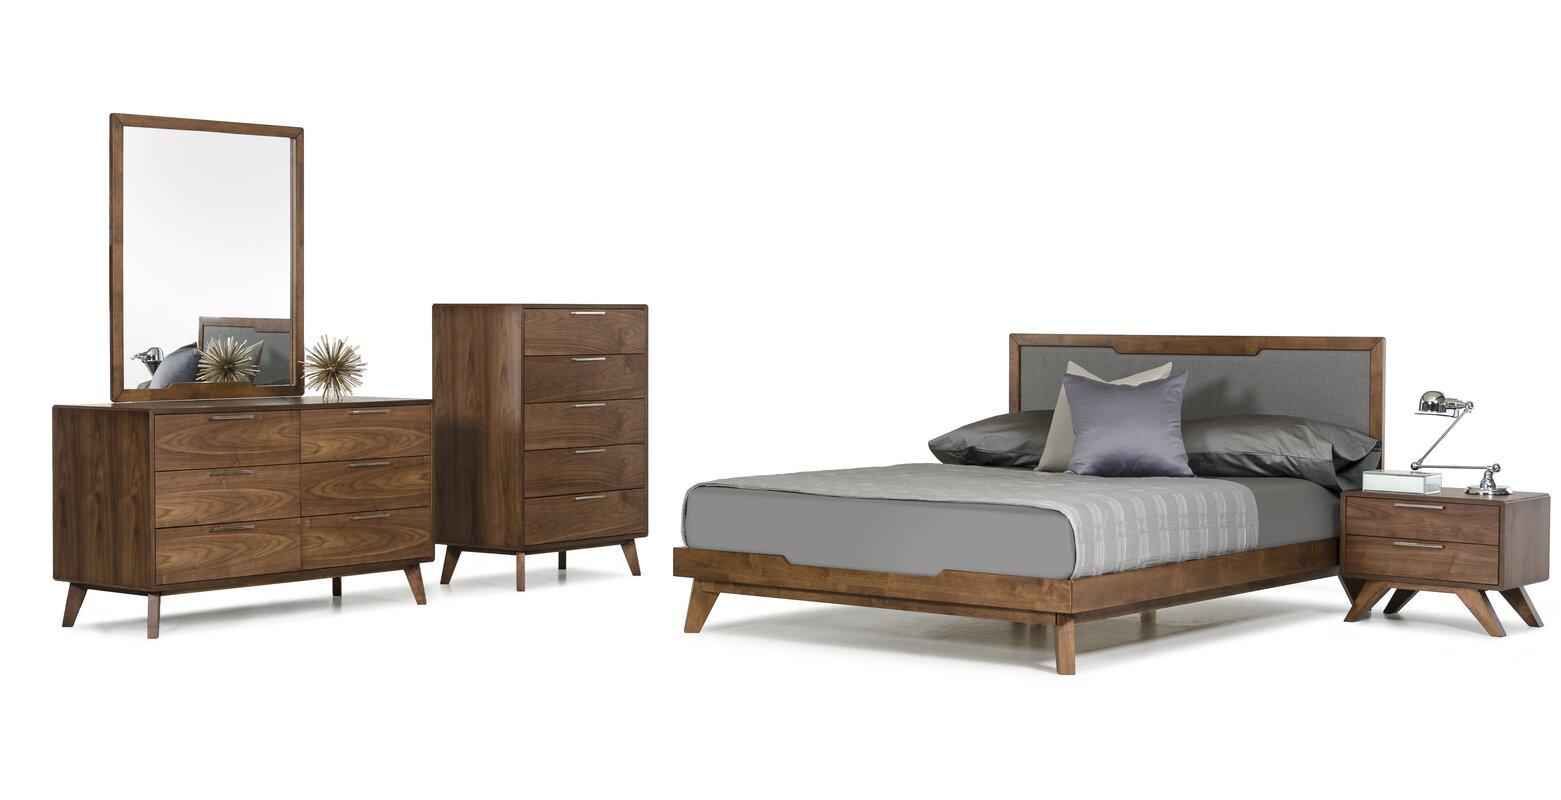 Hali Platform 5 Piece Bedroom Set. Modern   Contemporary Bedroom Sets   AllModern